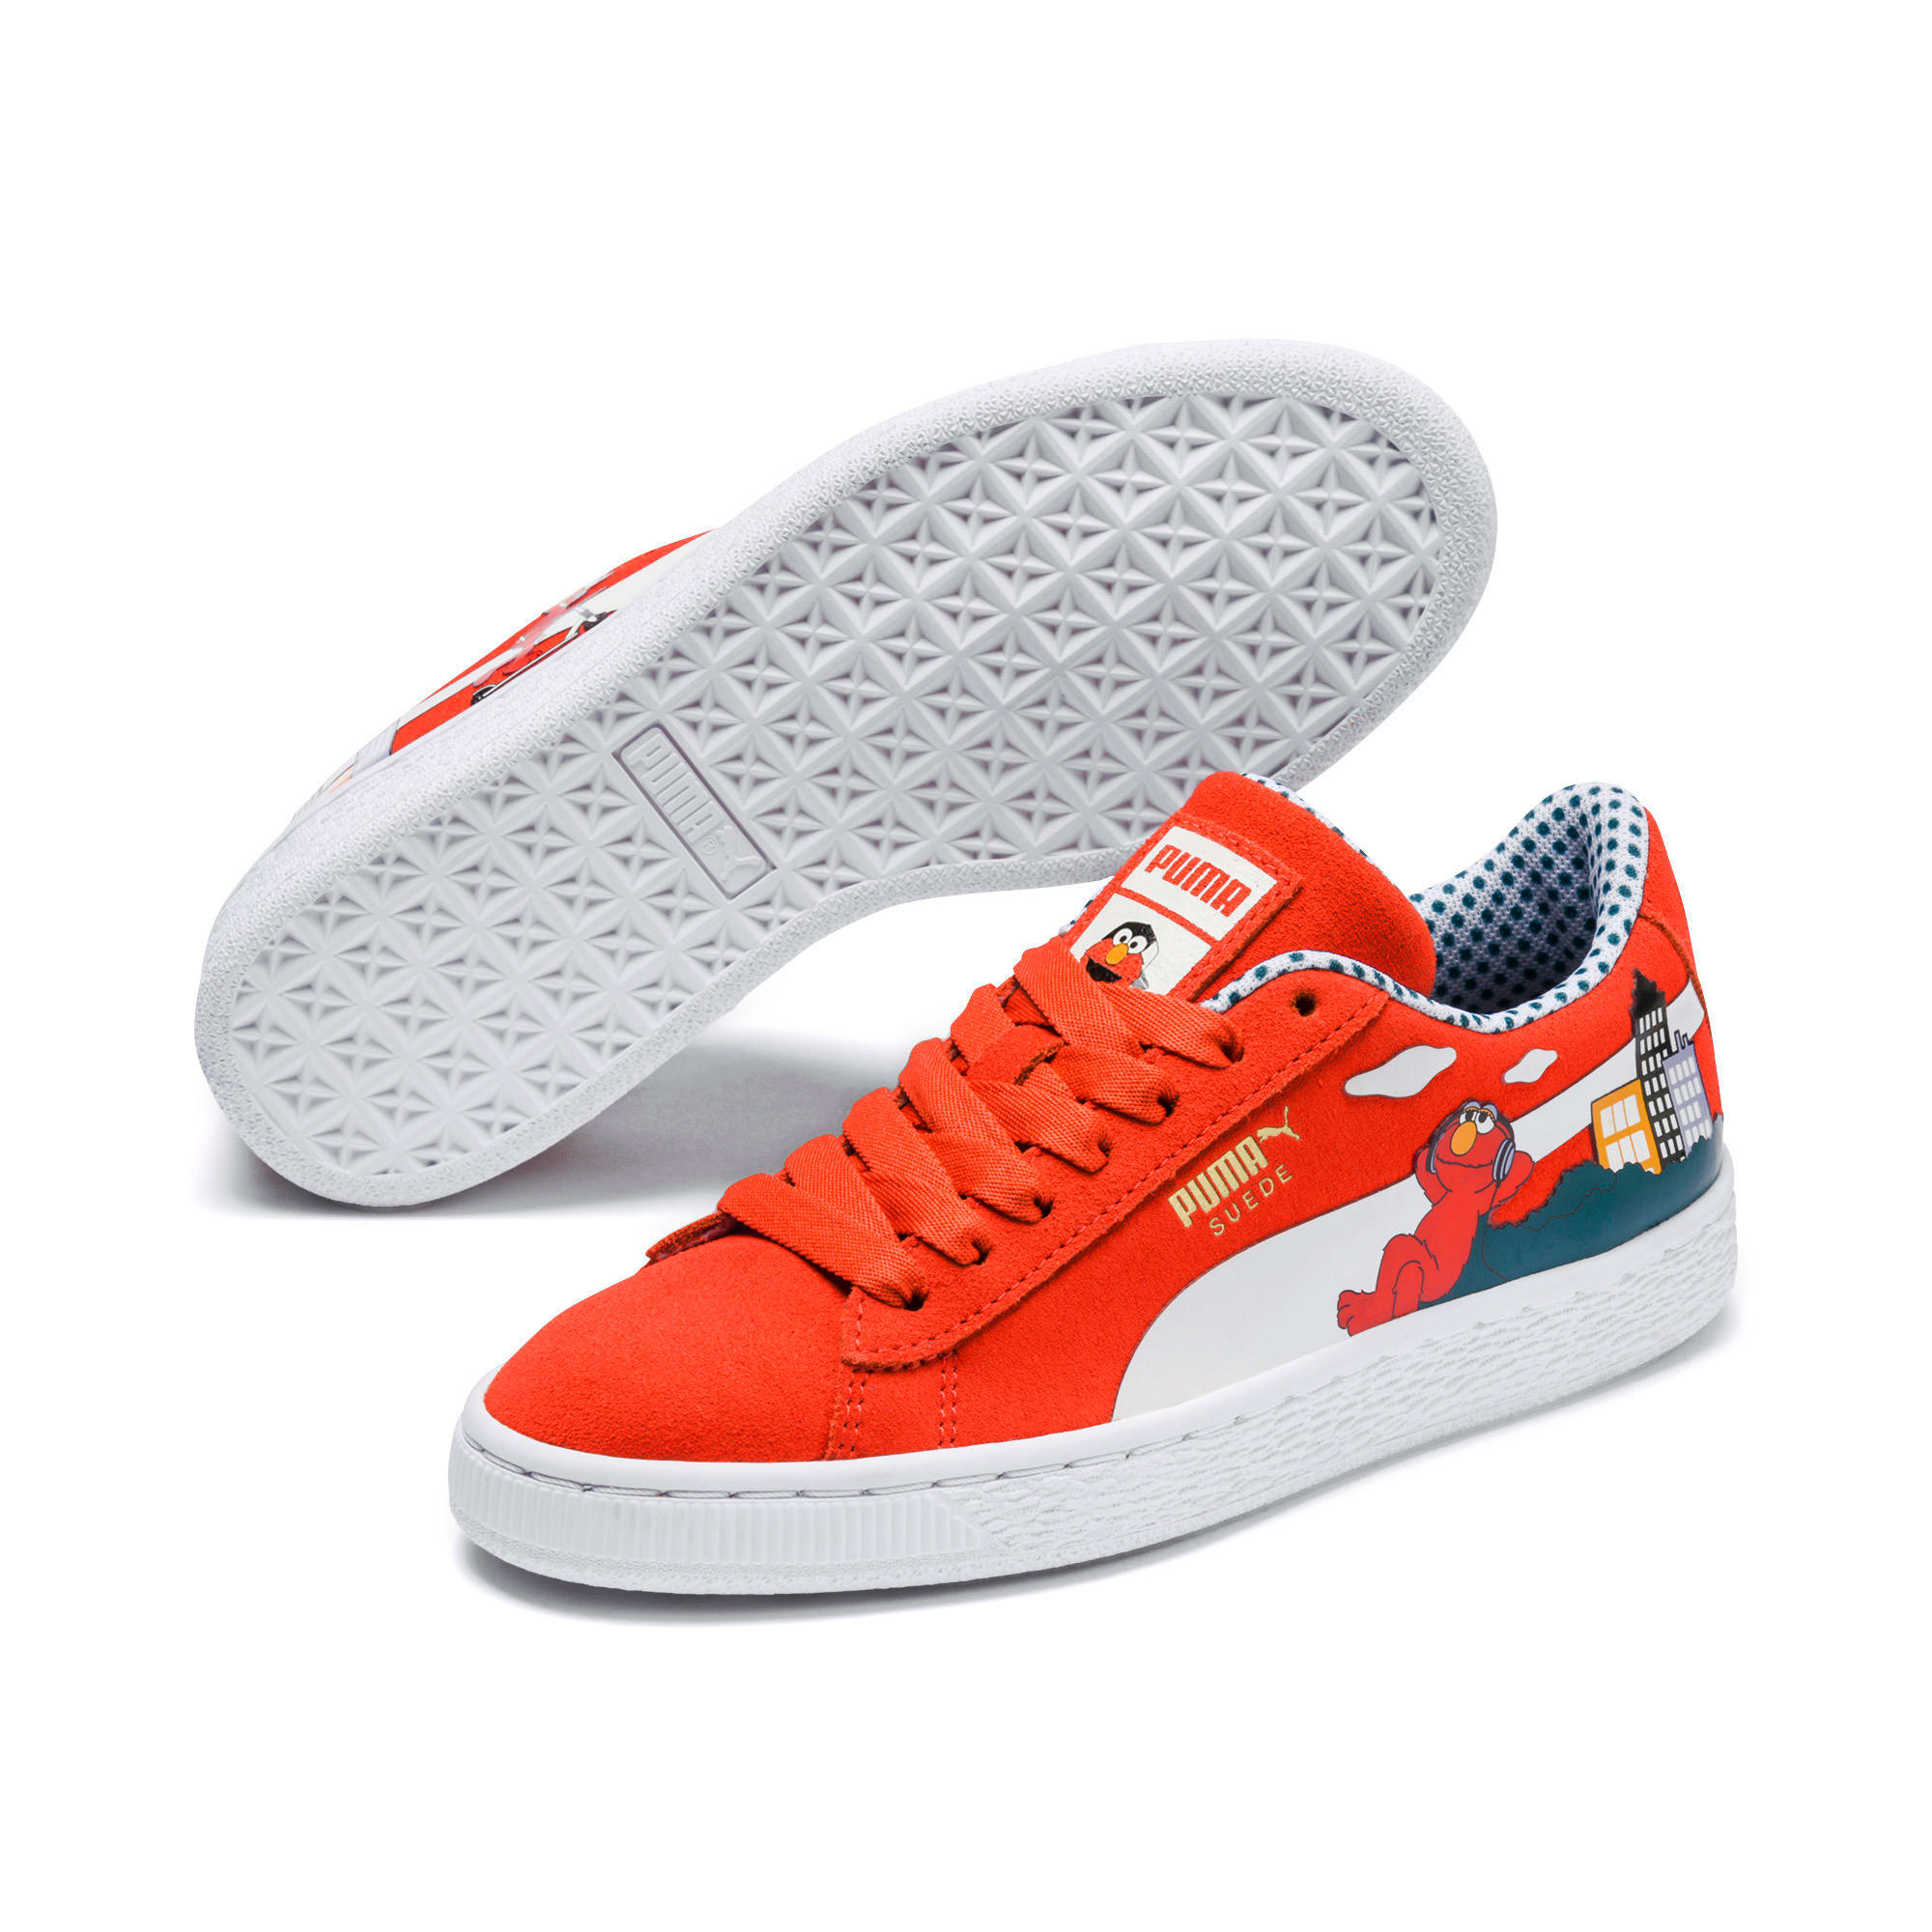 Thumbnail 2 of Sesame Street 50 Suede Sneakers JR, Cherry Tomato-Puma White, medium